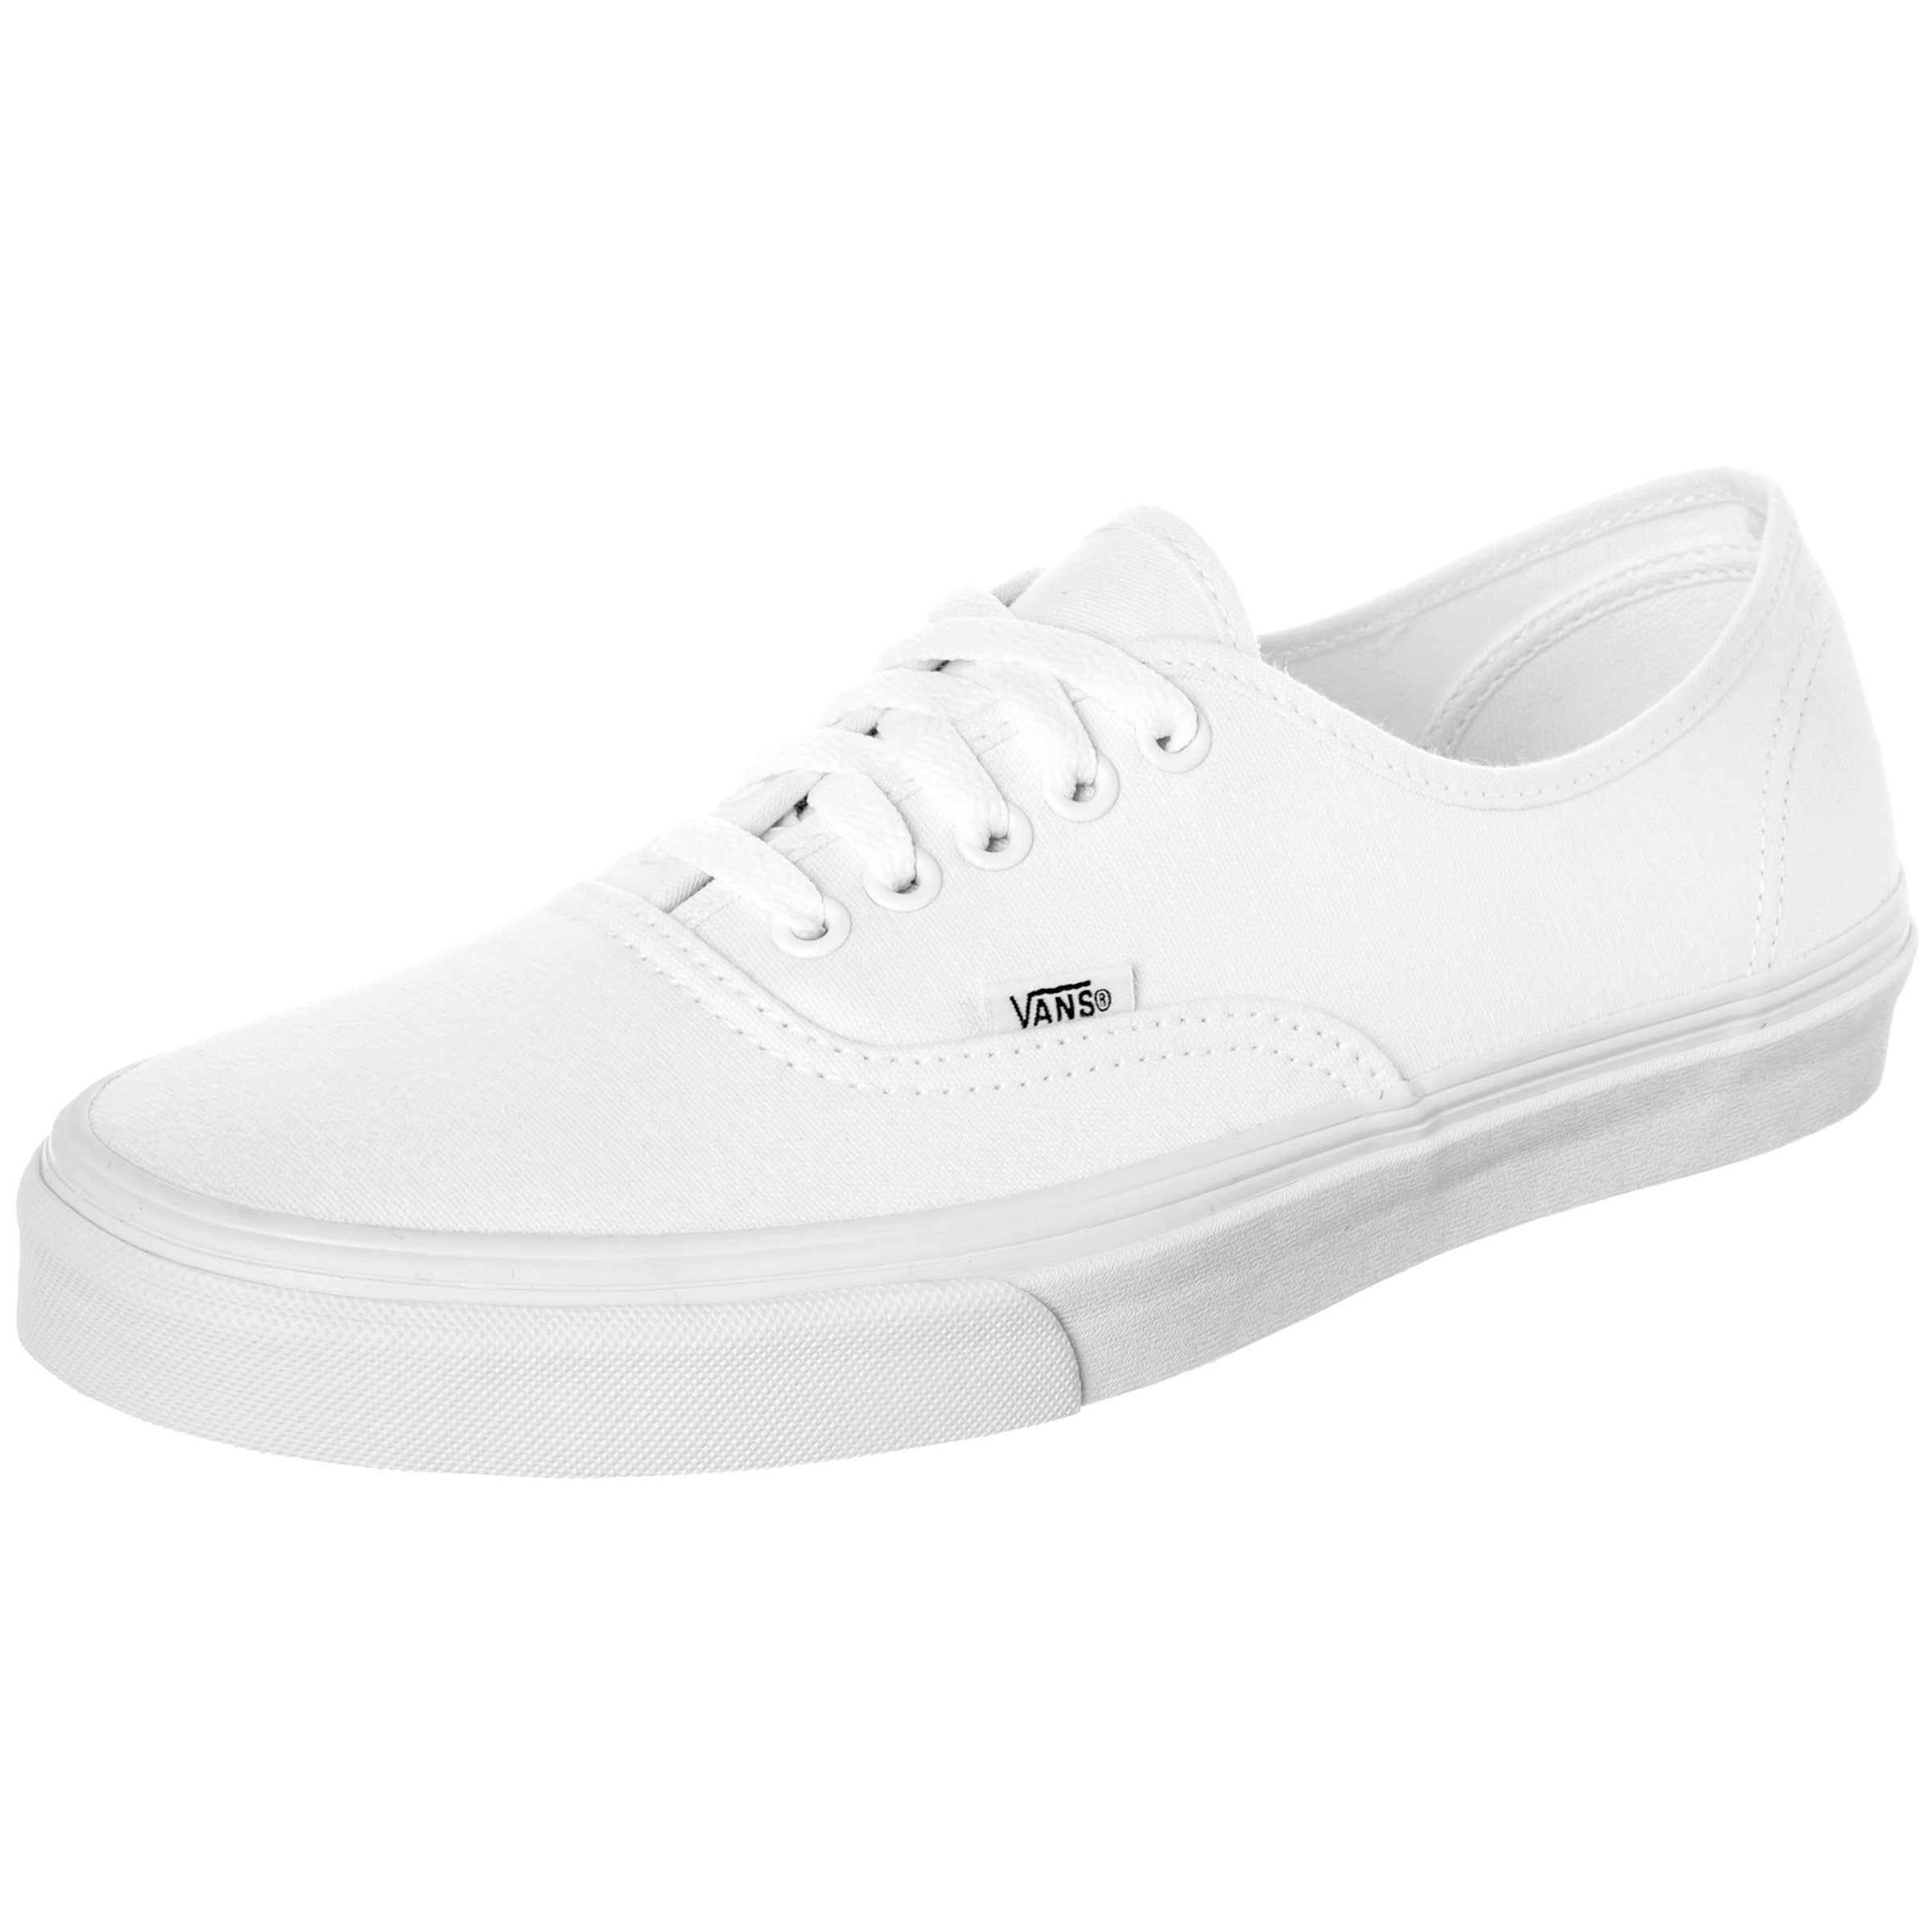 Haltbare Mode billige Schuhe VANS | Sneaker Authentic Schuhe Gut getragene Schuhe